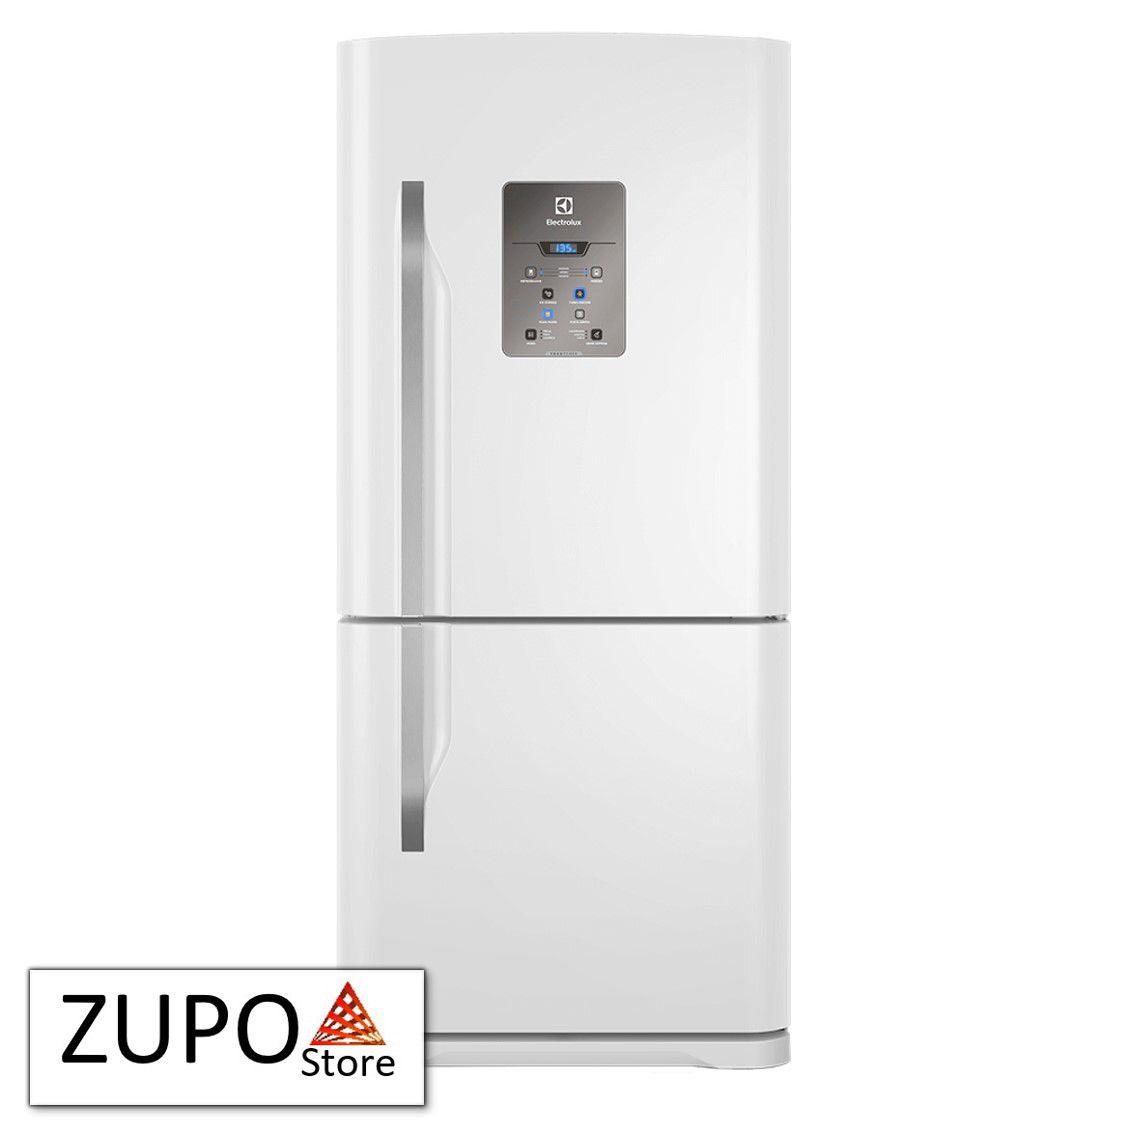 Refrigerador Branco 598 Litros Electrolux - DB84 - 127V